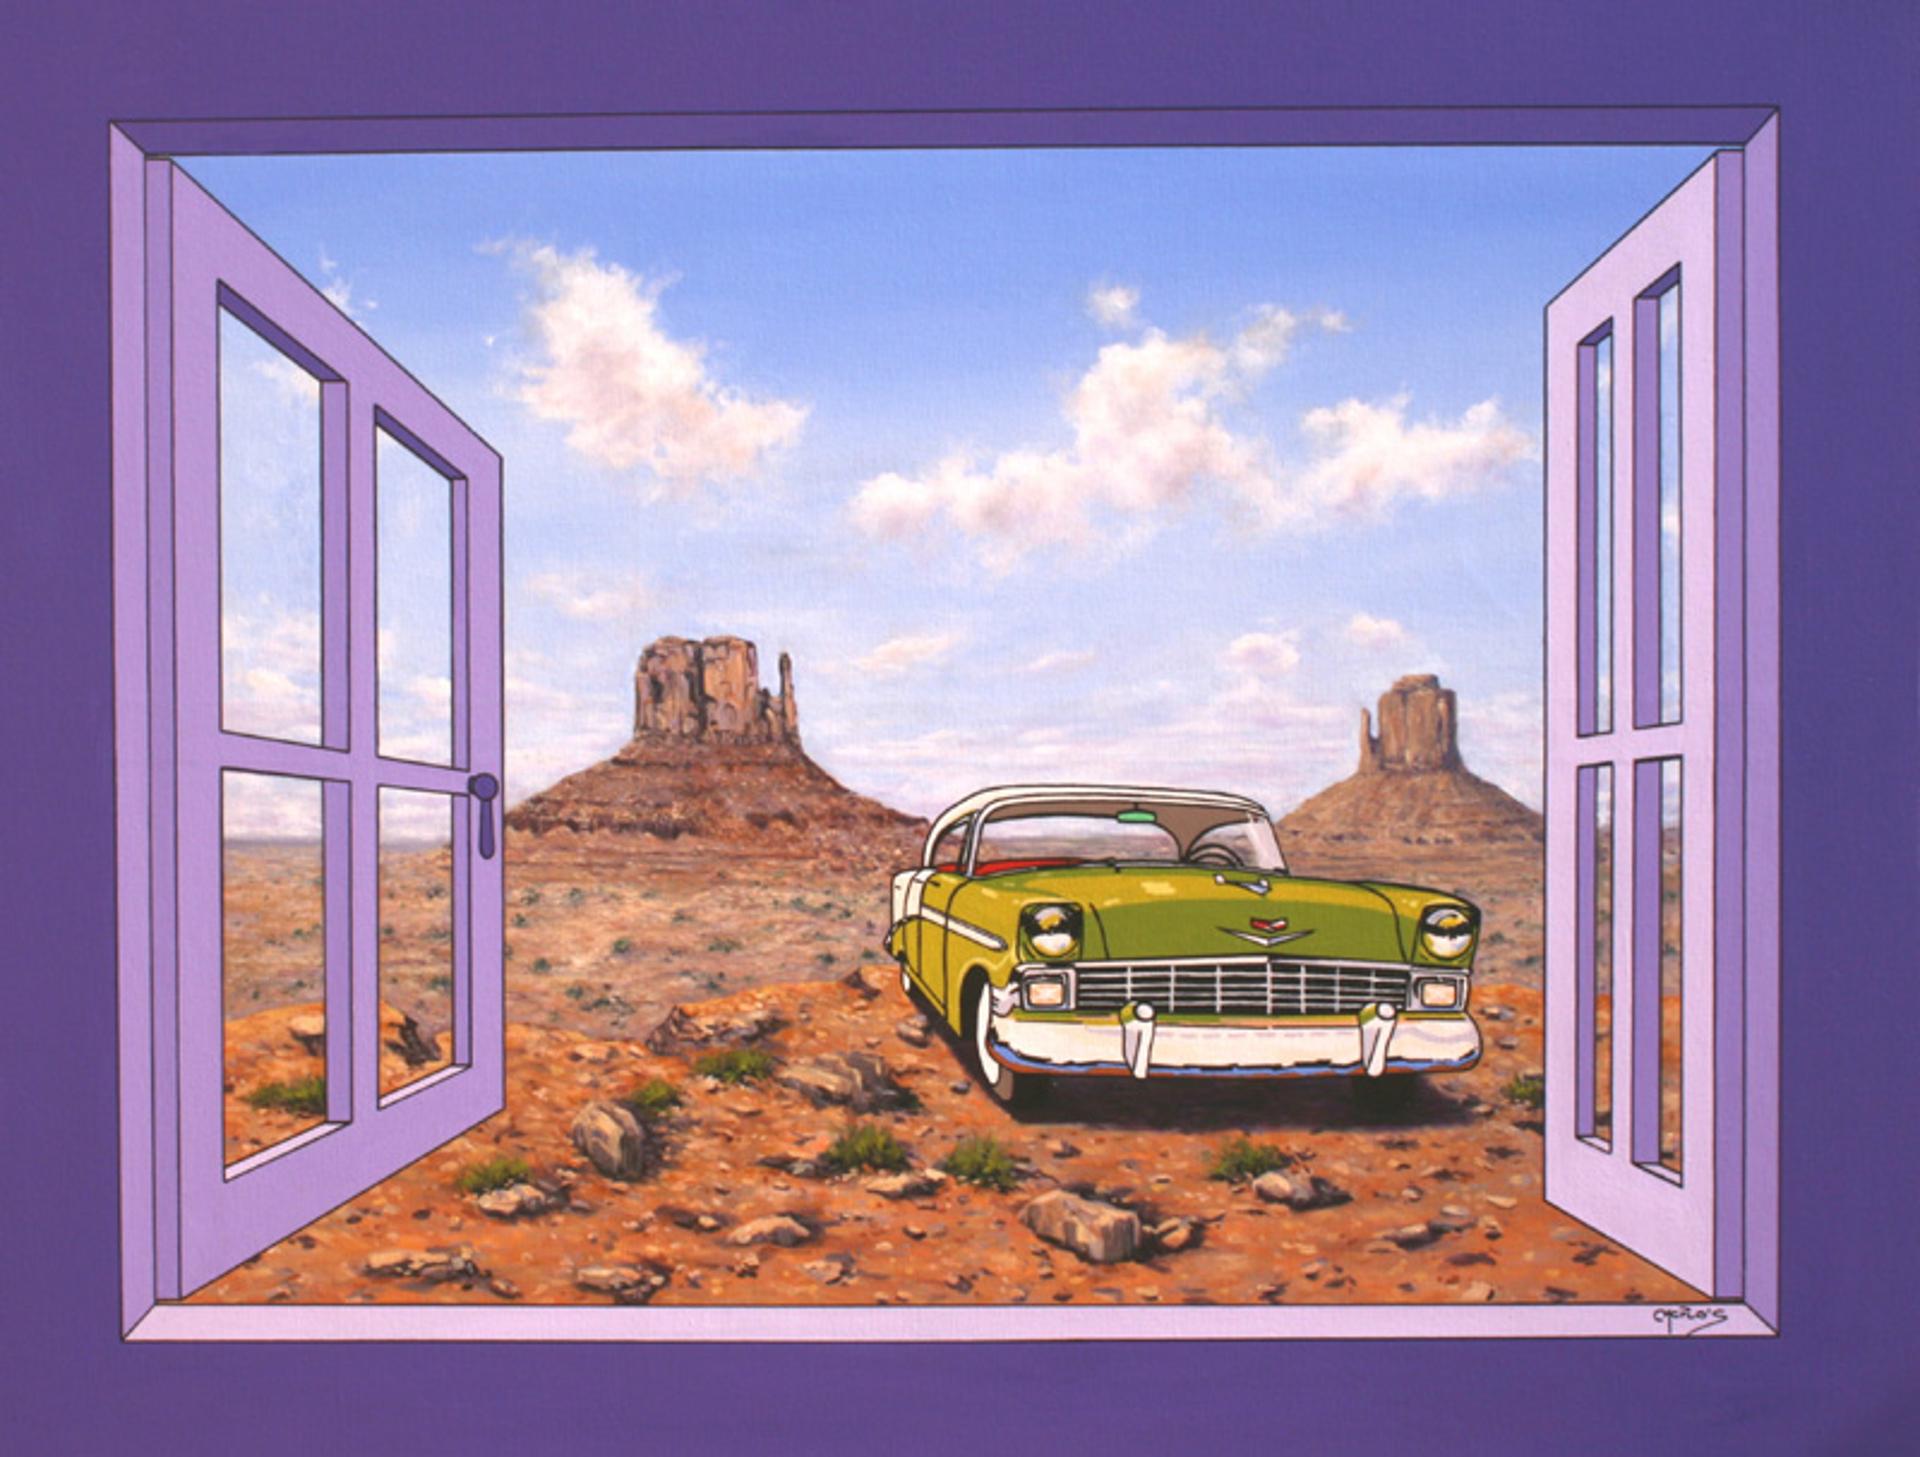 MG085 Solitary Cadillac -Chevy - Chevy Solitario by Mario Garcia Miro